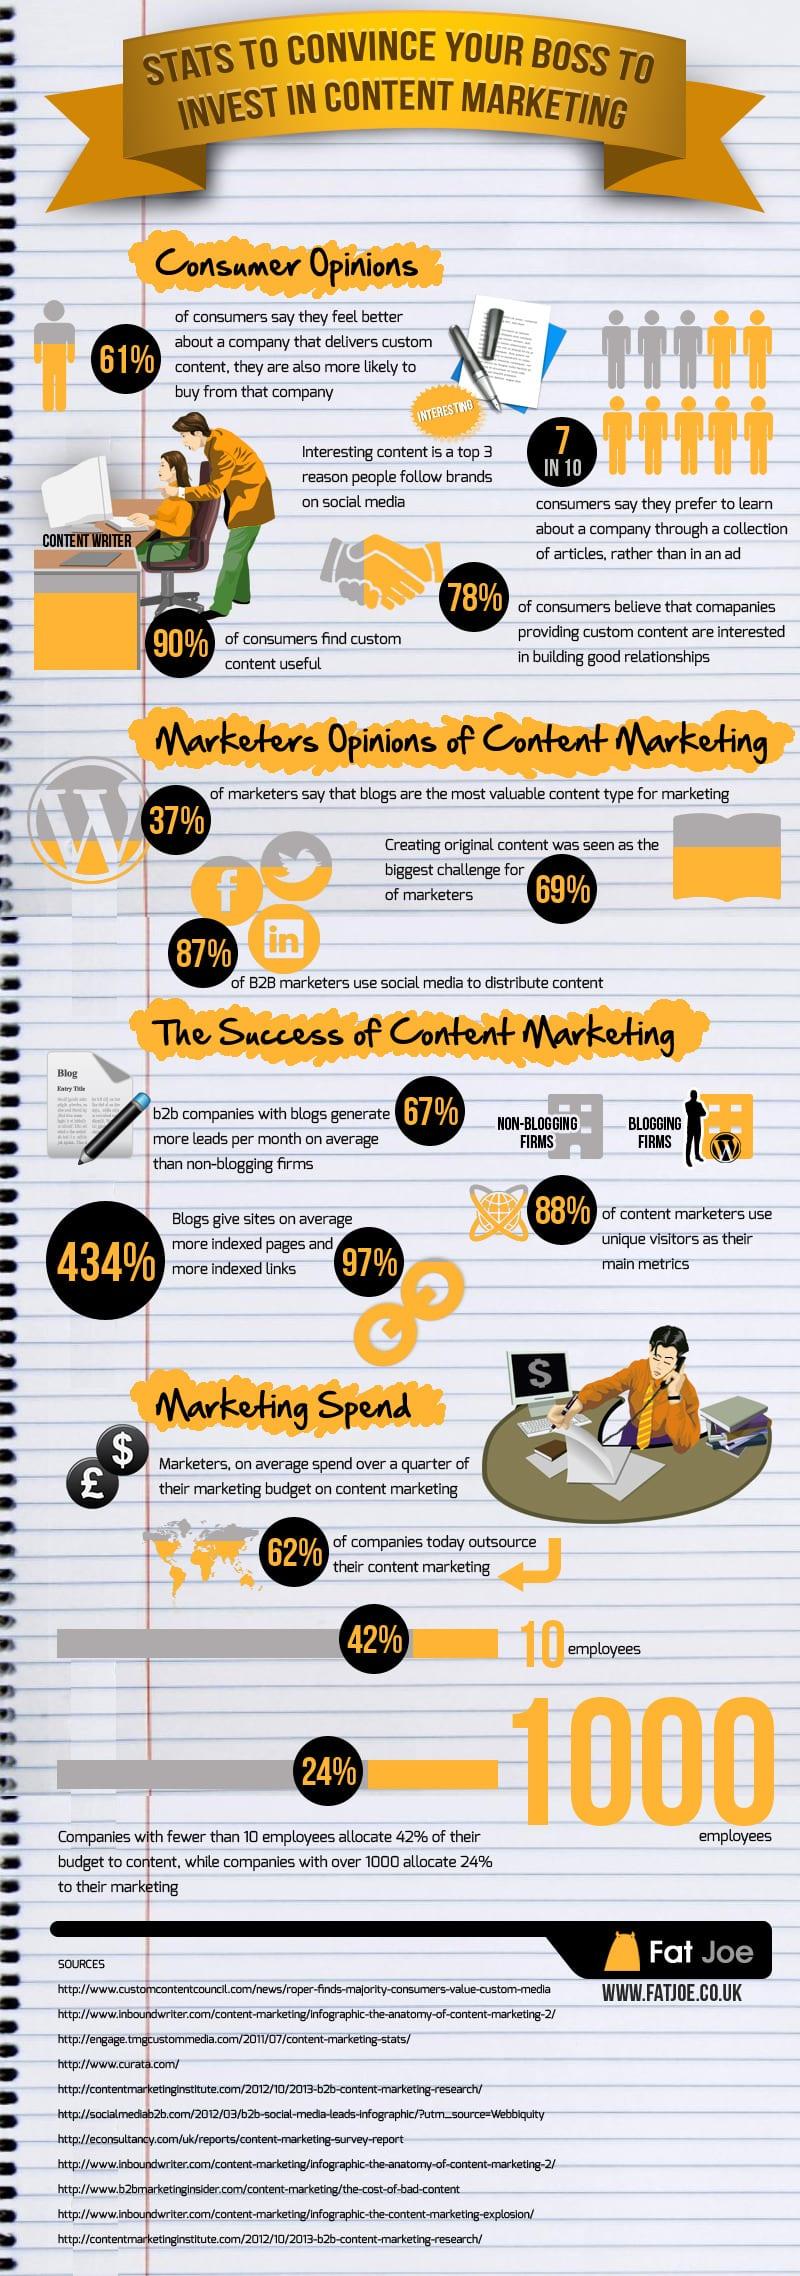 Creating a b2b digital marketing plan for 2017 infographic smart - Fat Joe Content Marketing Statsinvestcontentinfographic